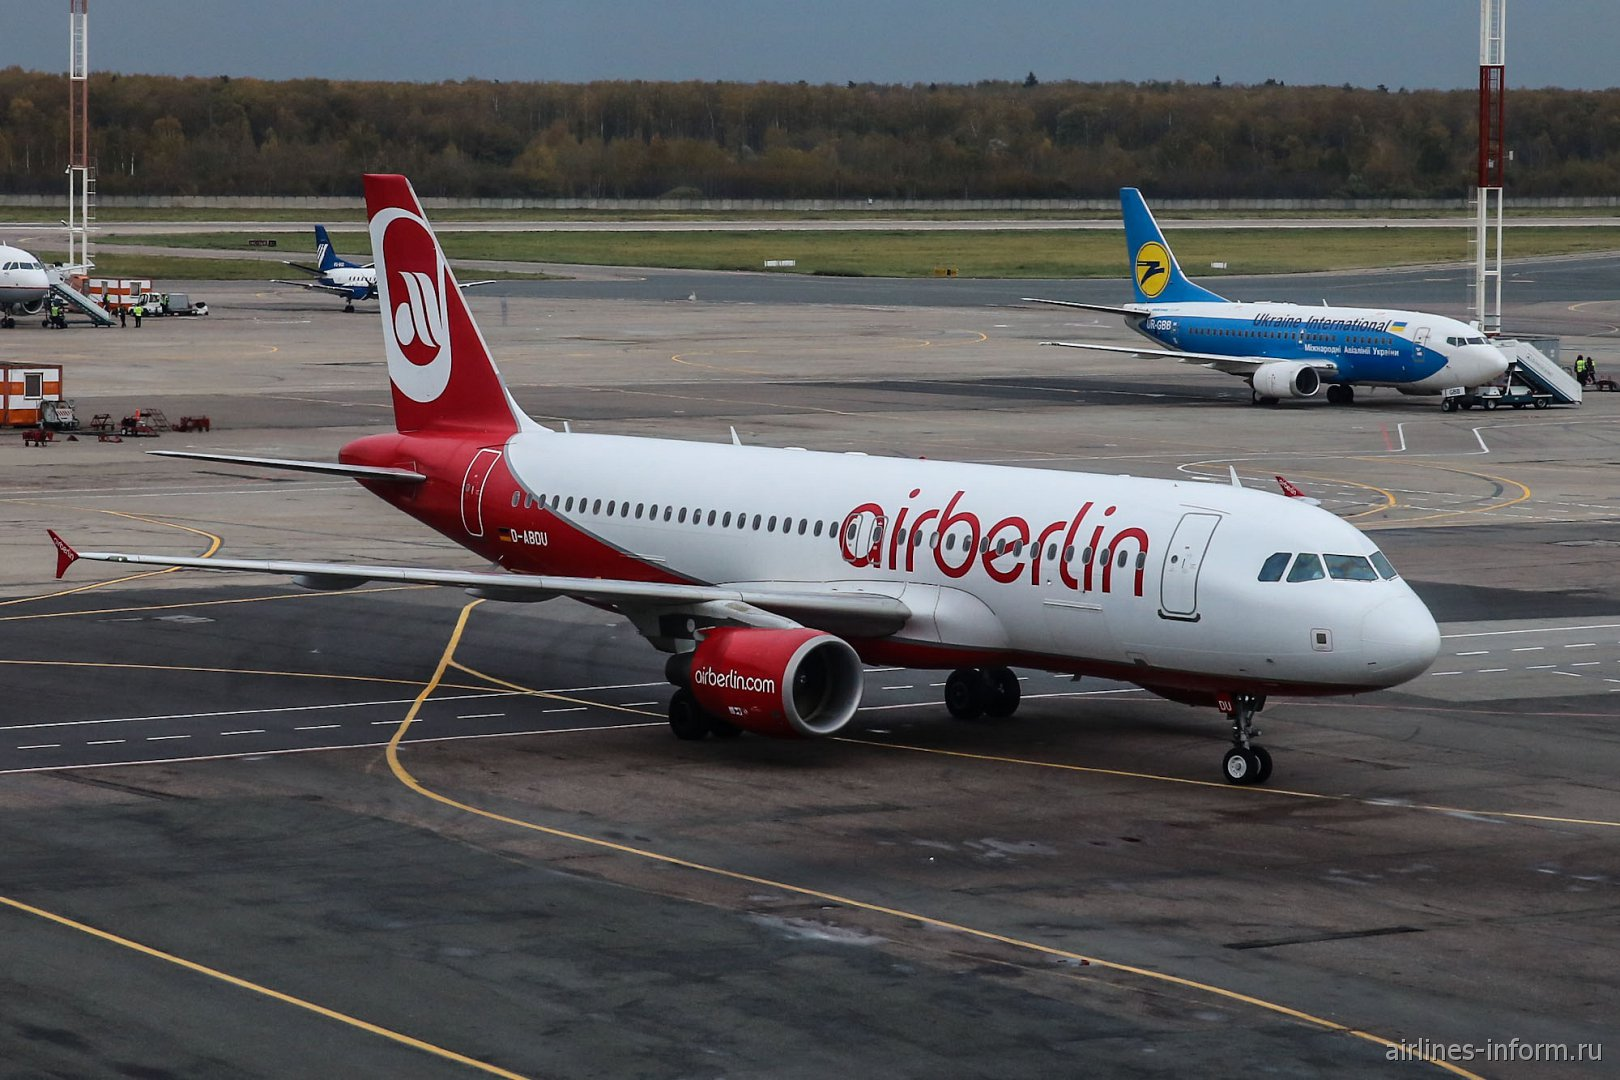 Airbus A320 авиакомпании Air Berlin в аэропорту Домодедово